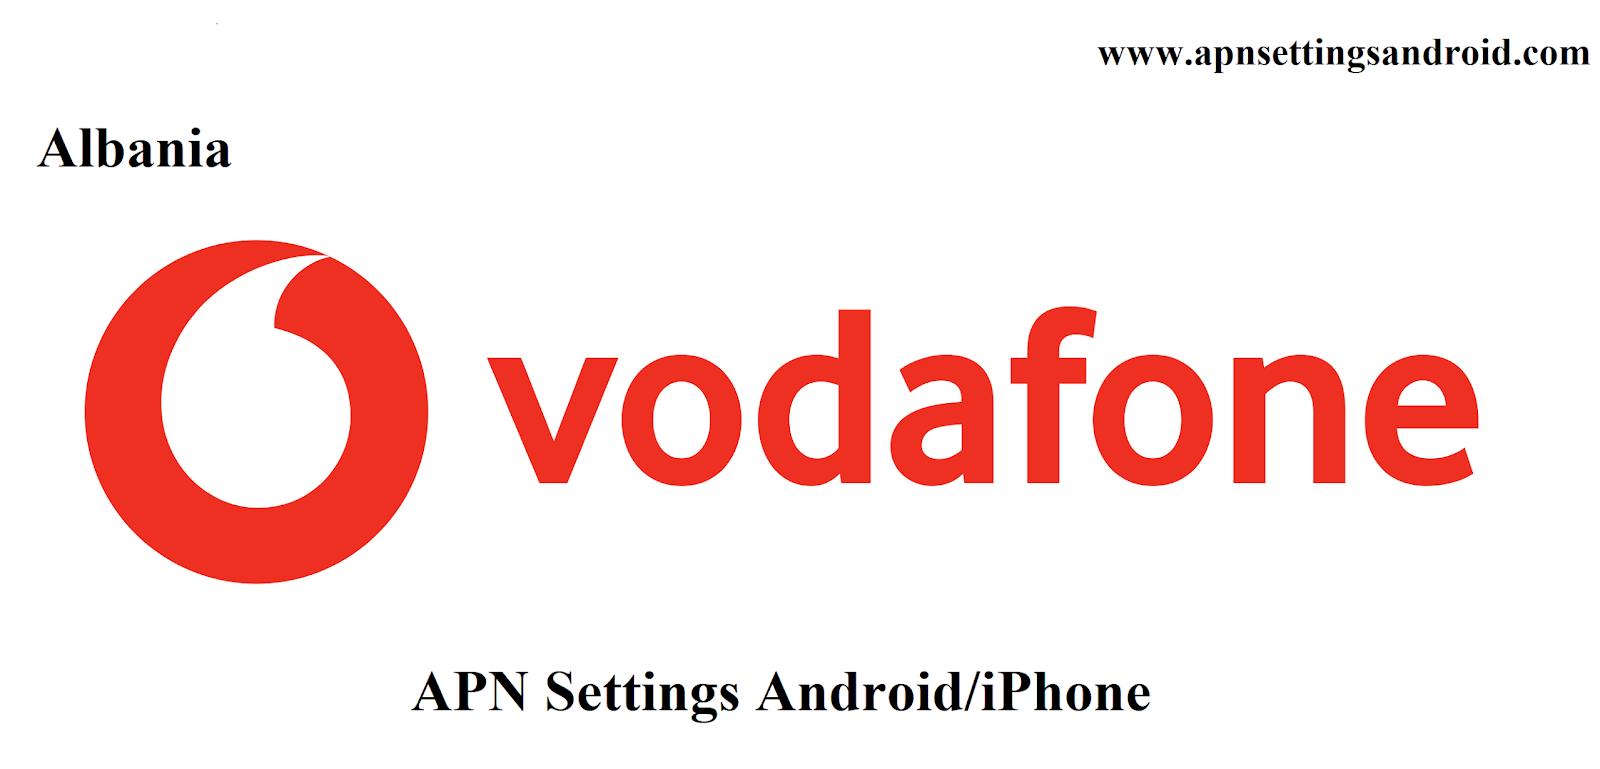 Vodafone Albania APN Settings for Android